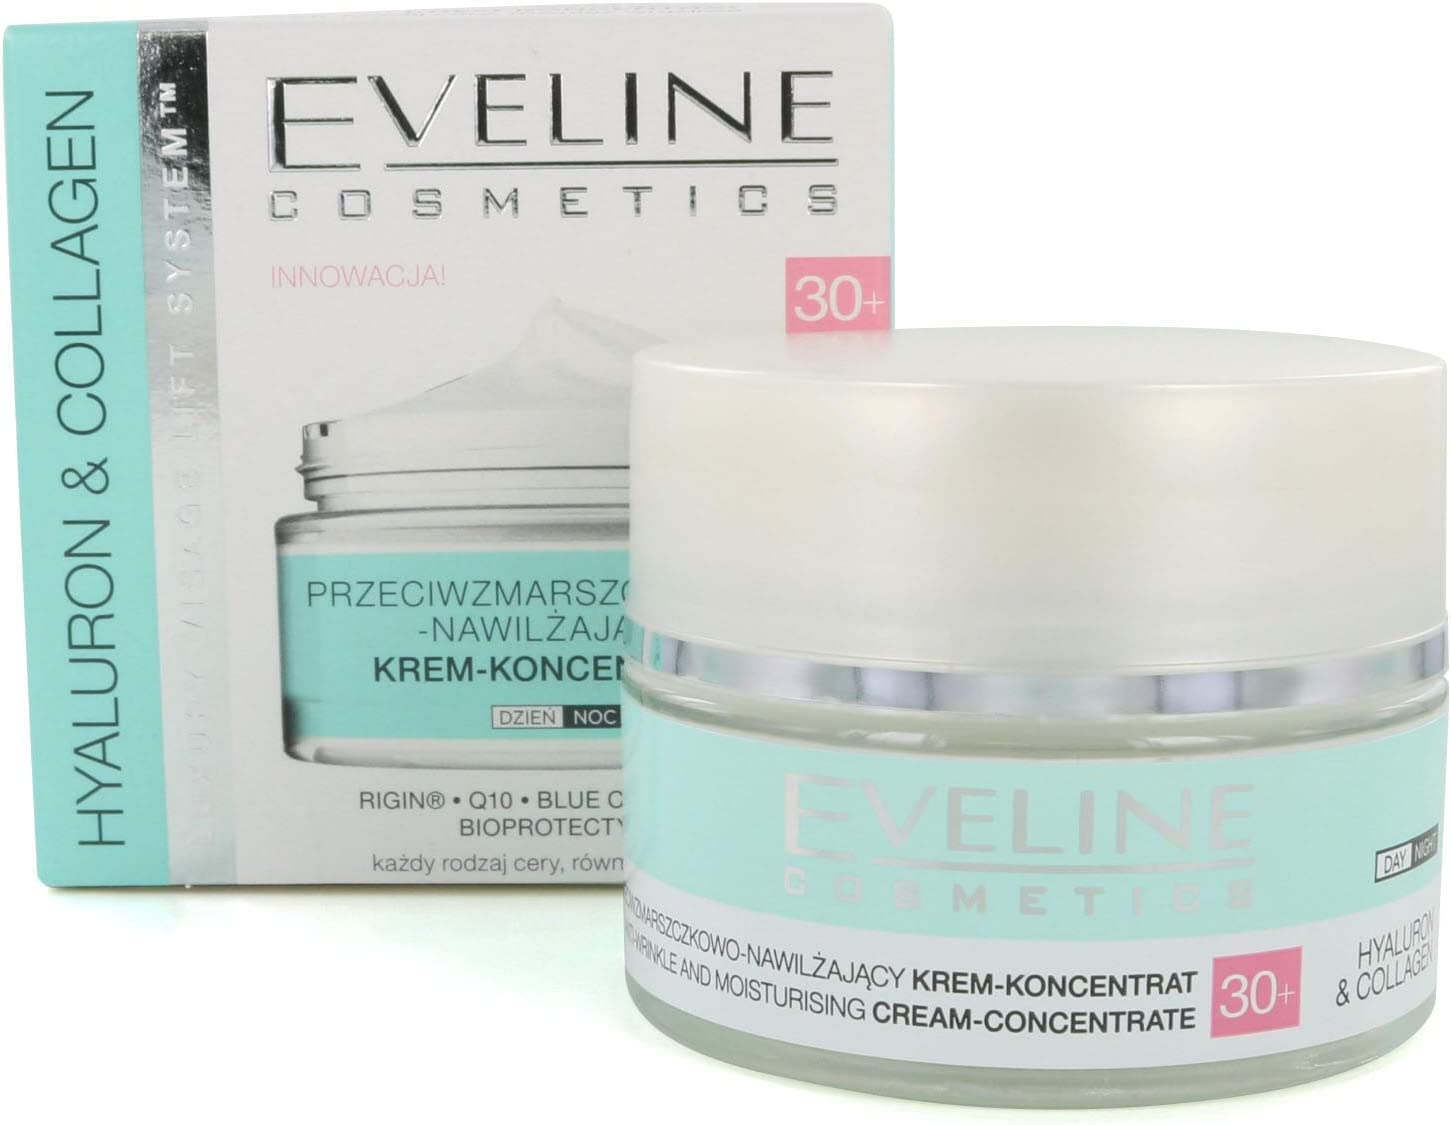 Eveline HYALURON & COLLAGEN Crema facial antiarrugas – Concentrado 30+ 50 ml